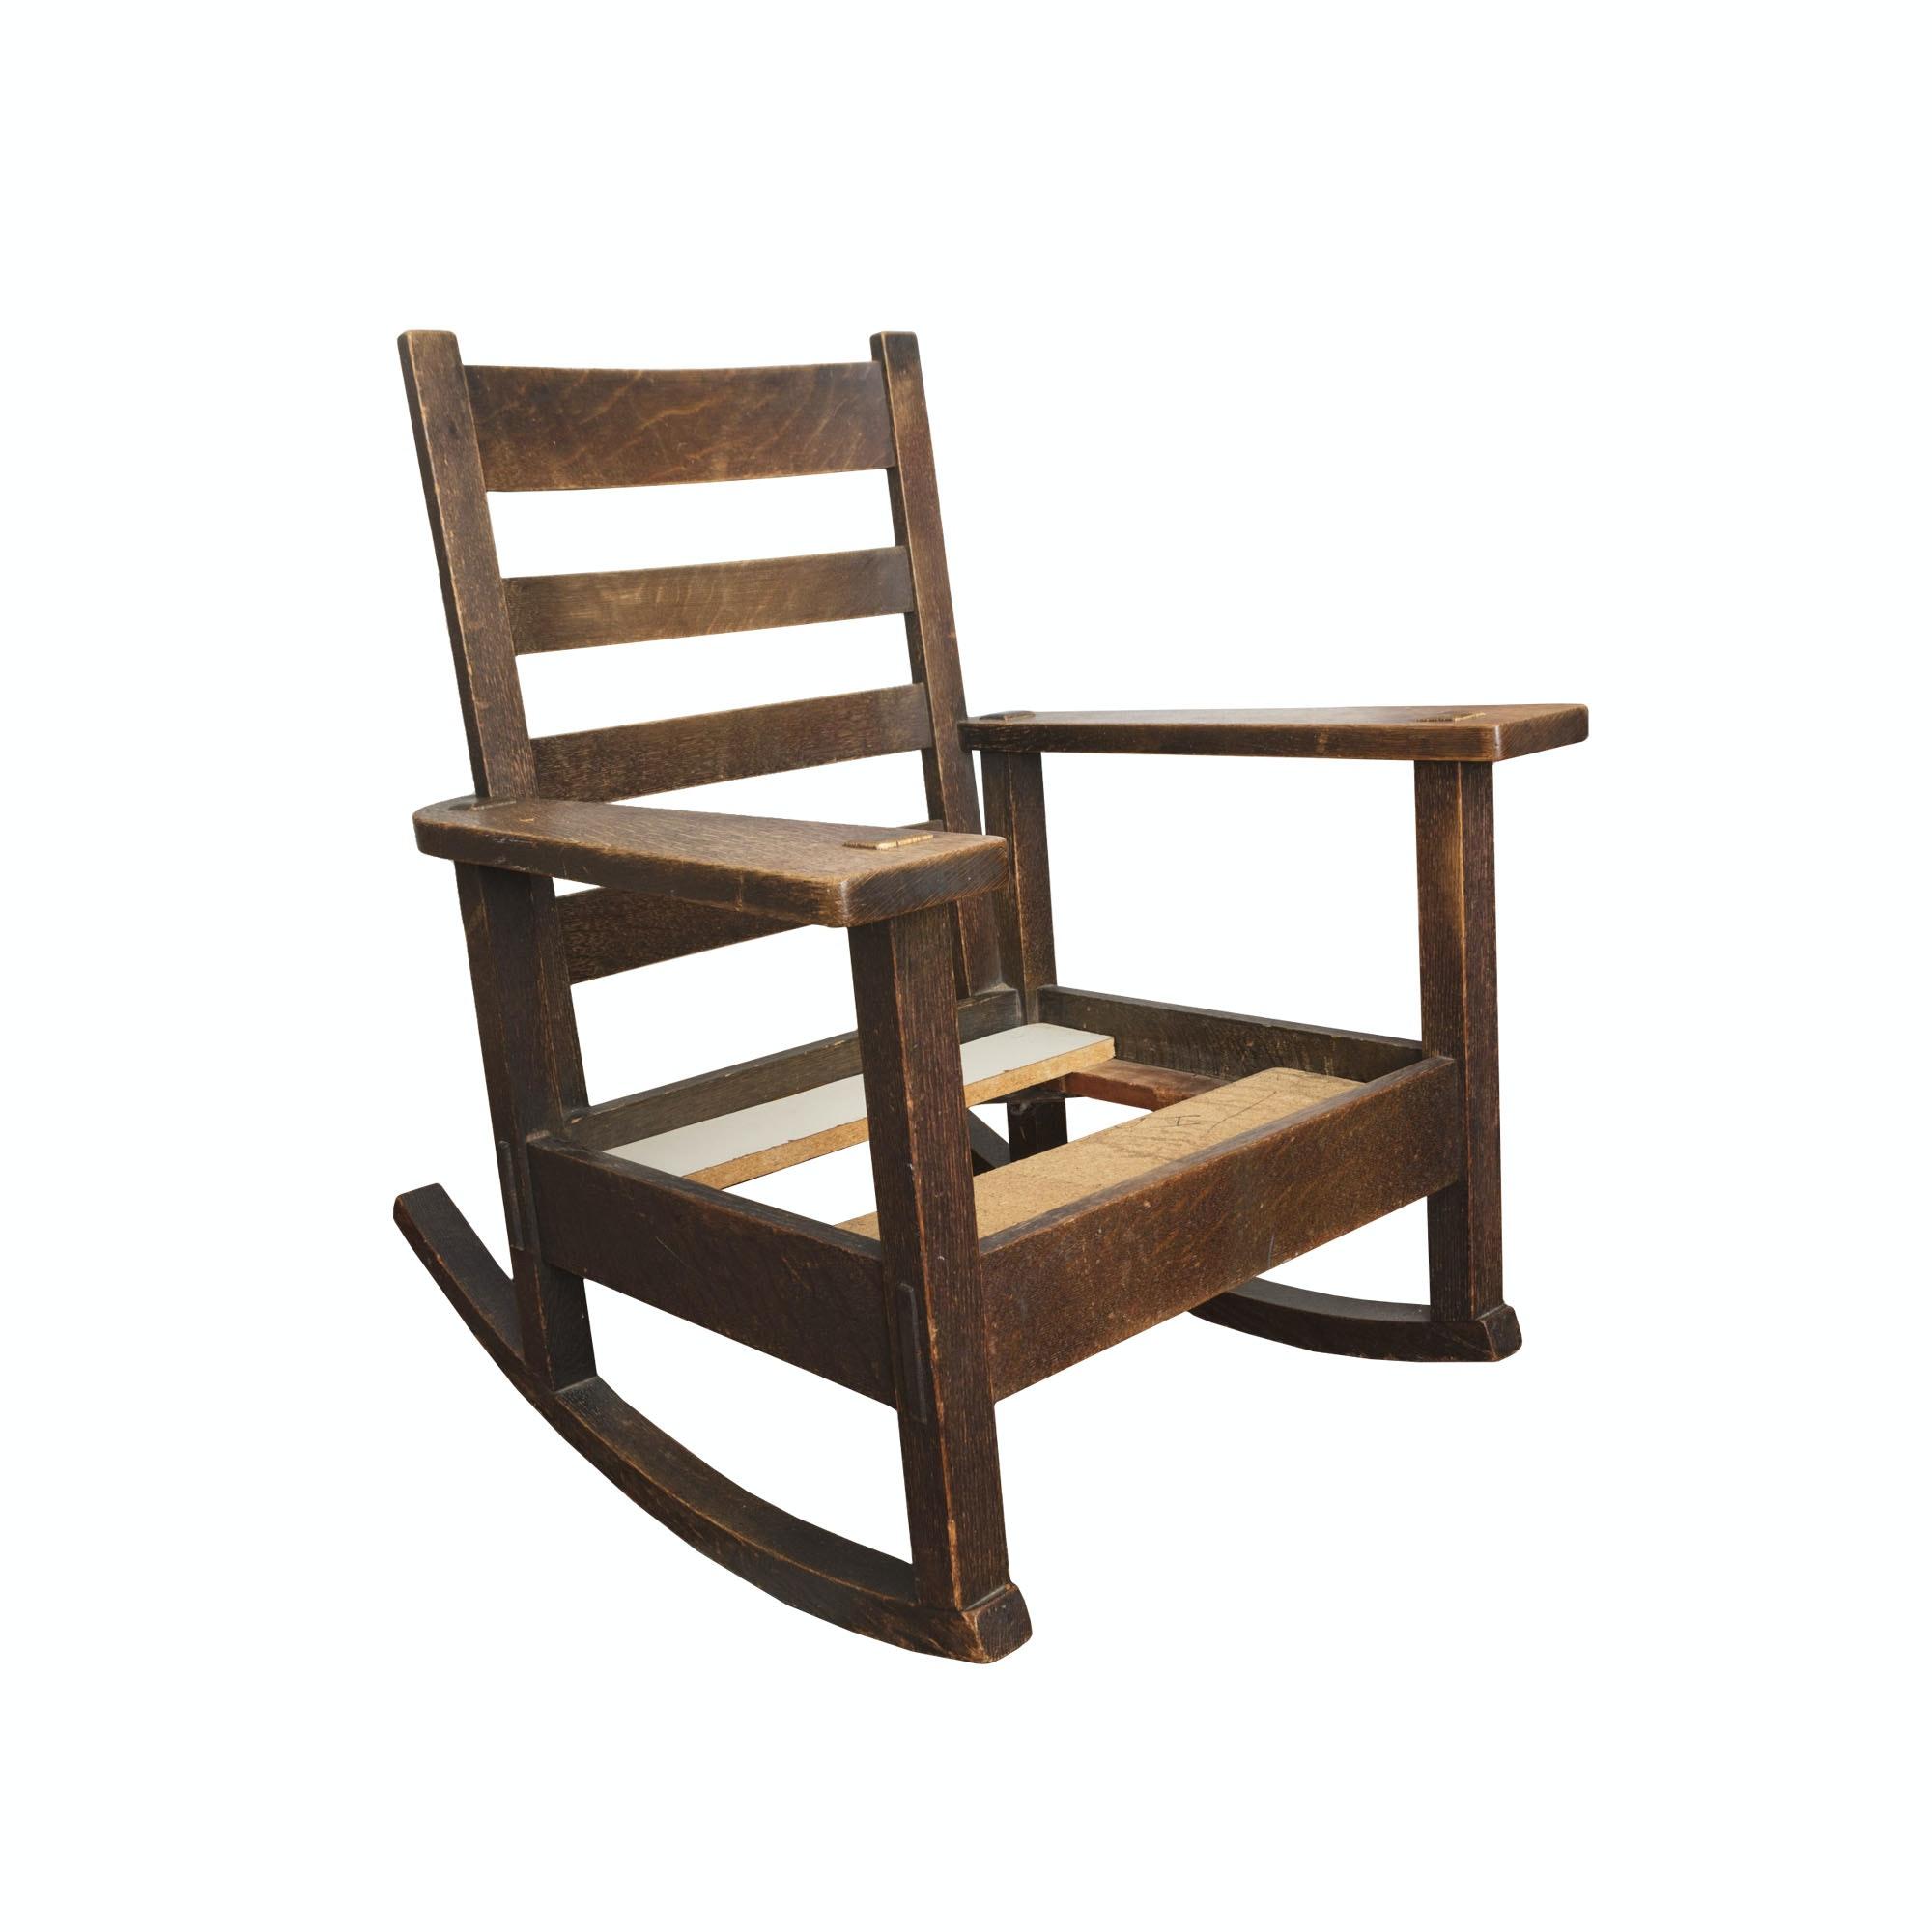 Quartersawn Oak Mission Style Rocking Chair Frame